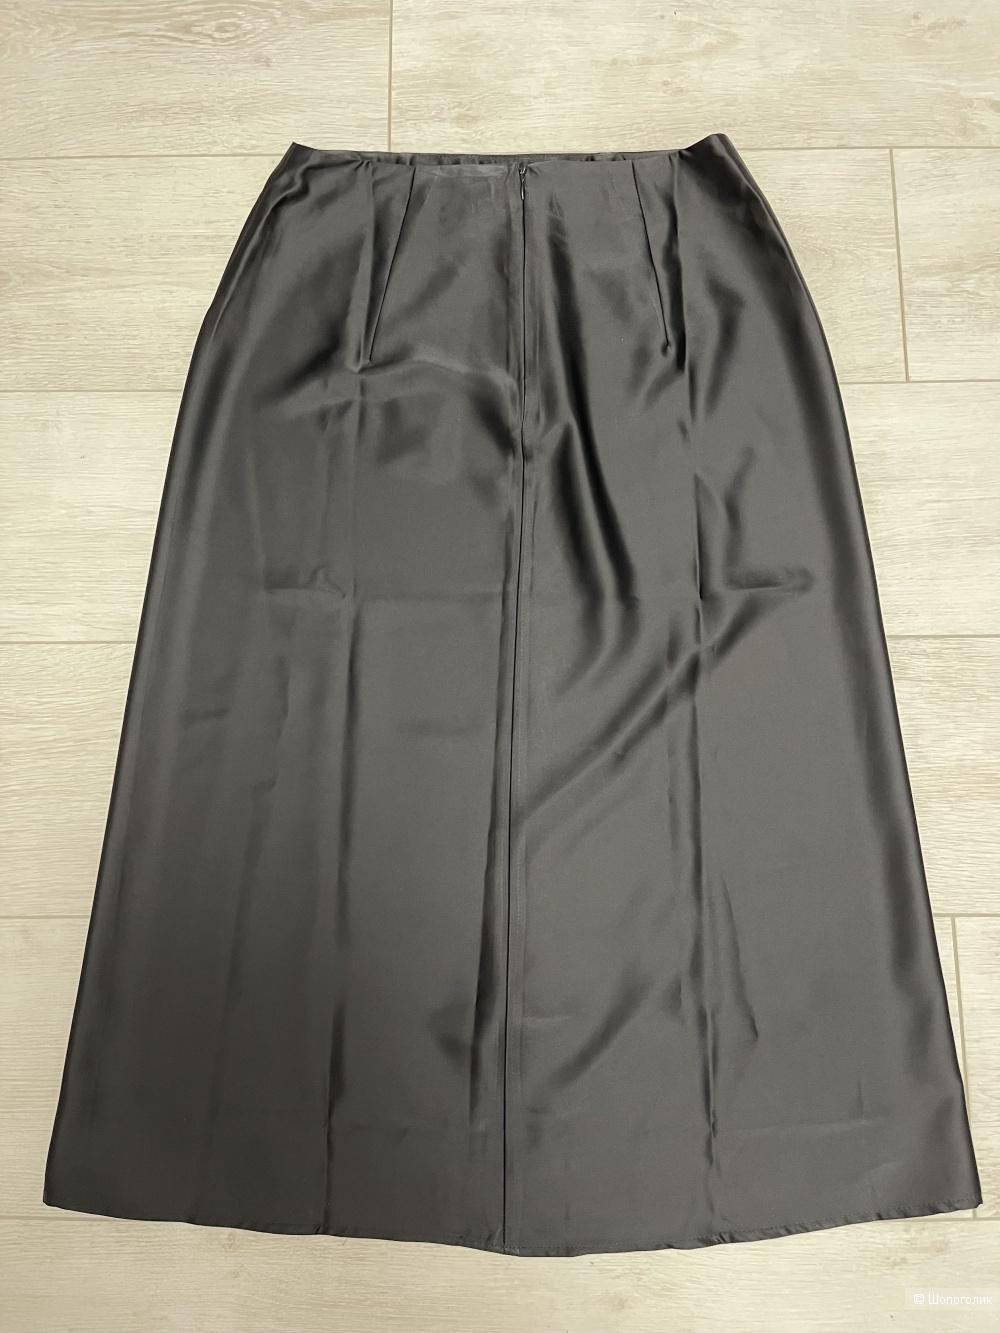 Юбка Calvin Klein размер S, 42-44